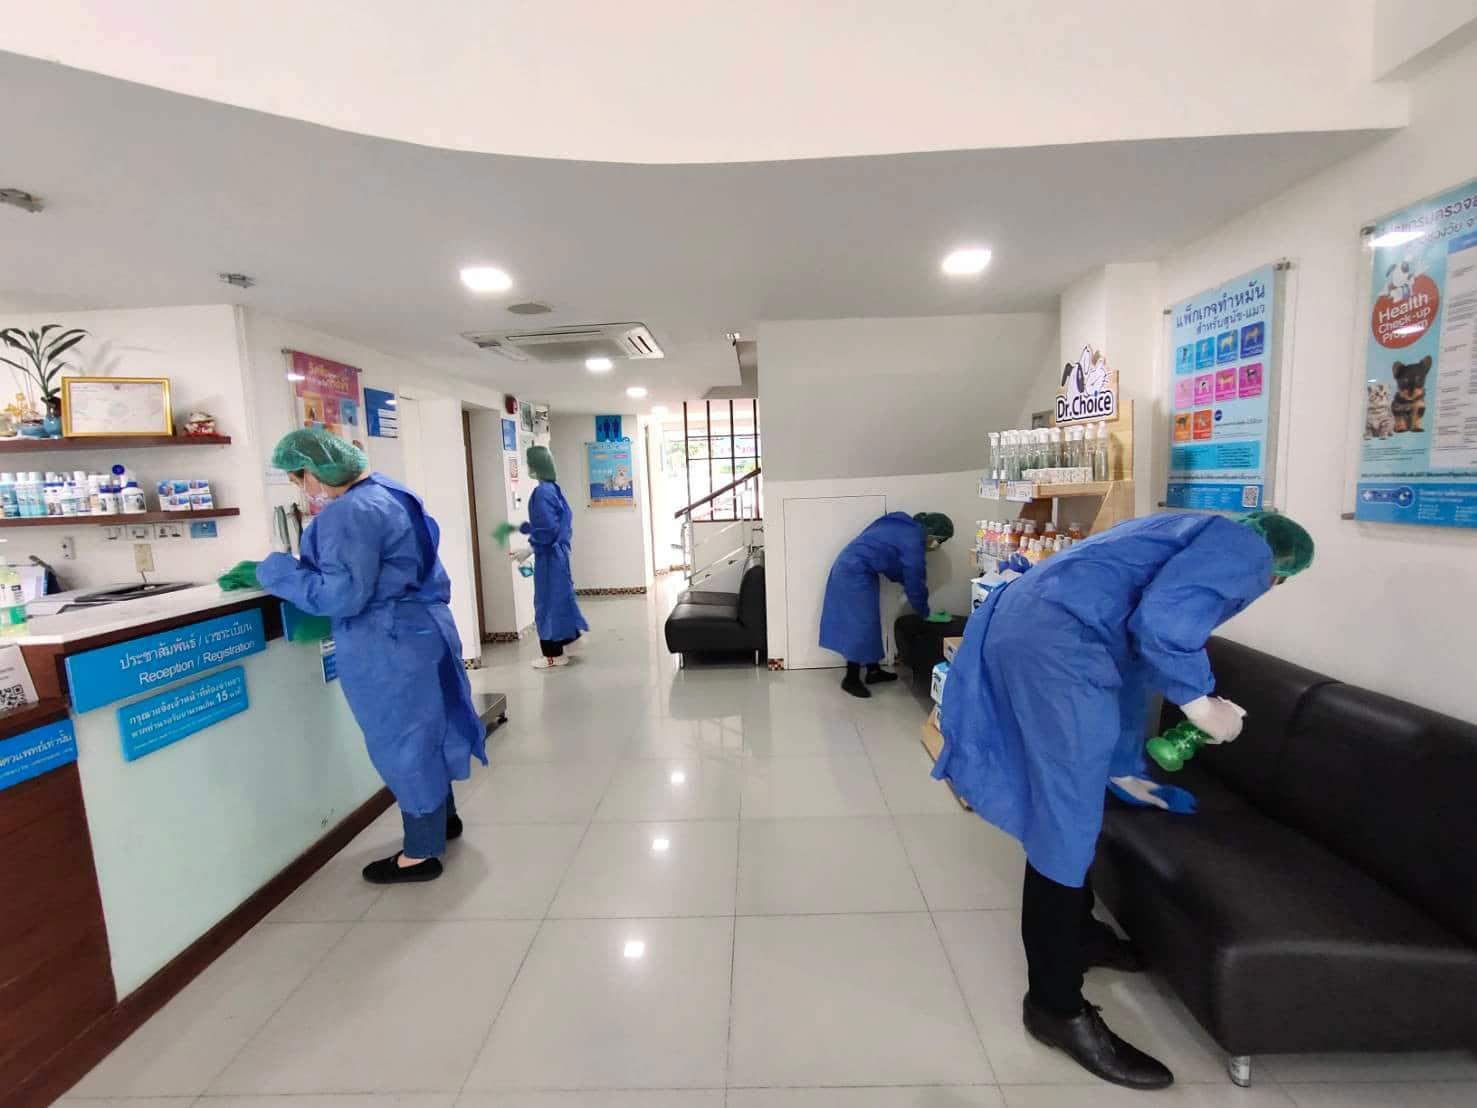 Sanitisation drive at the Thonglor Pet Hospital, Chiang Mai